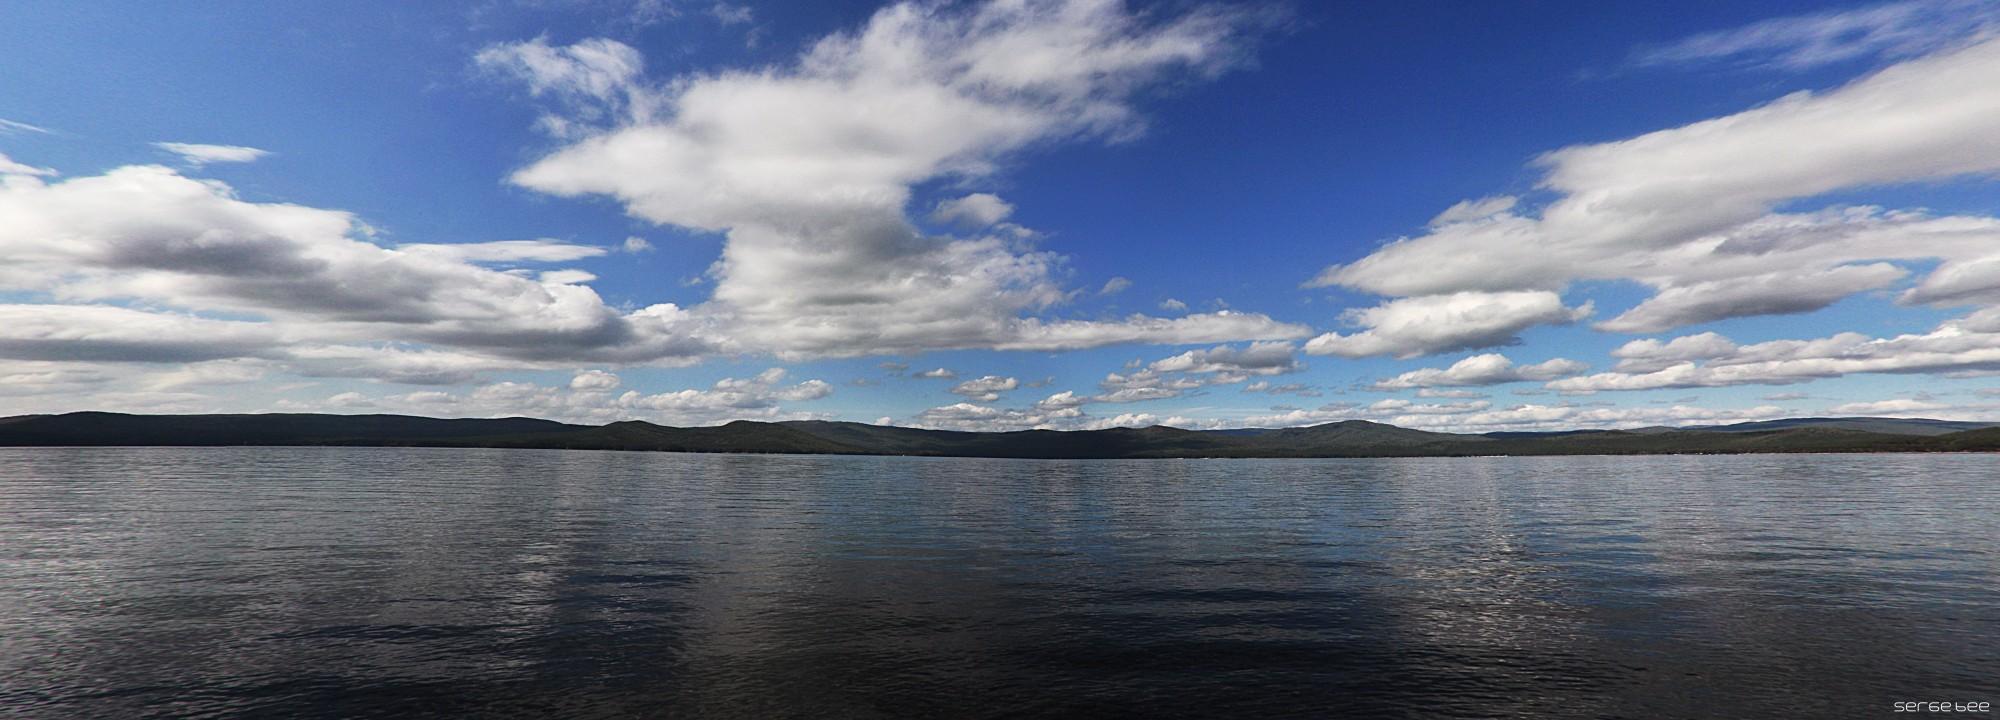 "фото ""Озеро Тургояк"" метки: пейзаж, панорама, Turgoyal lake Ural озеро Турго"